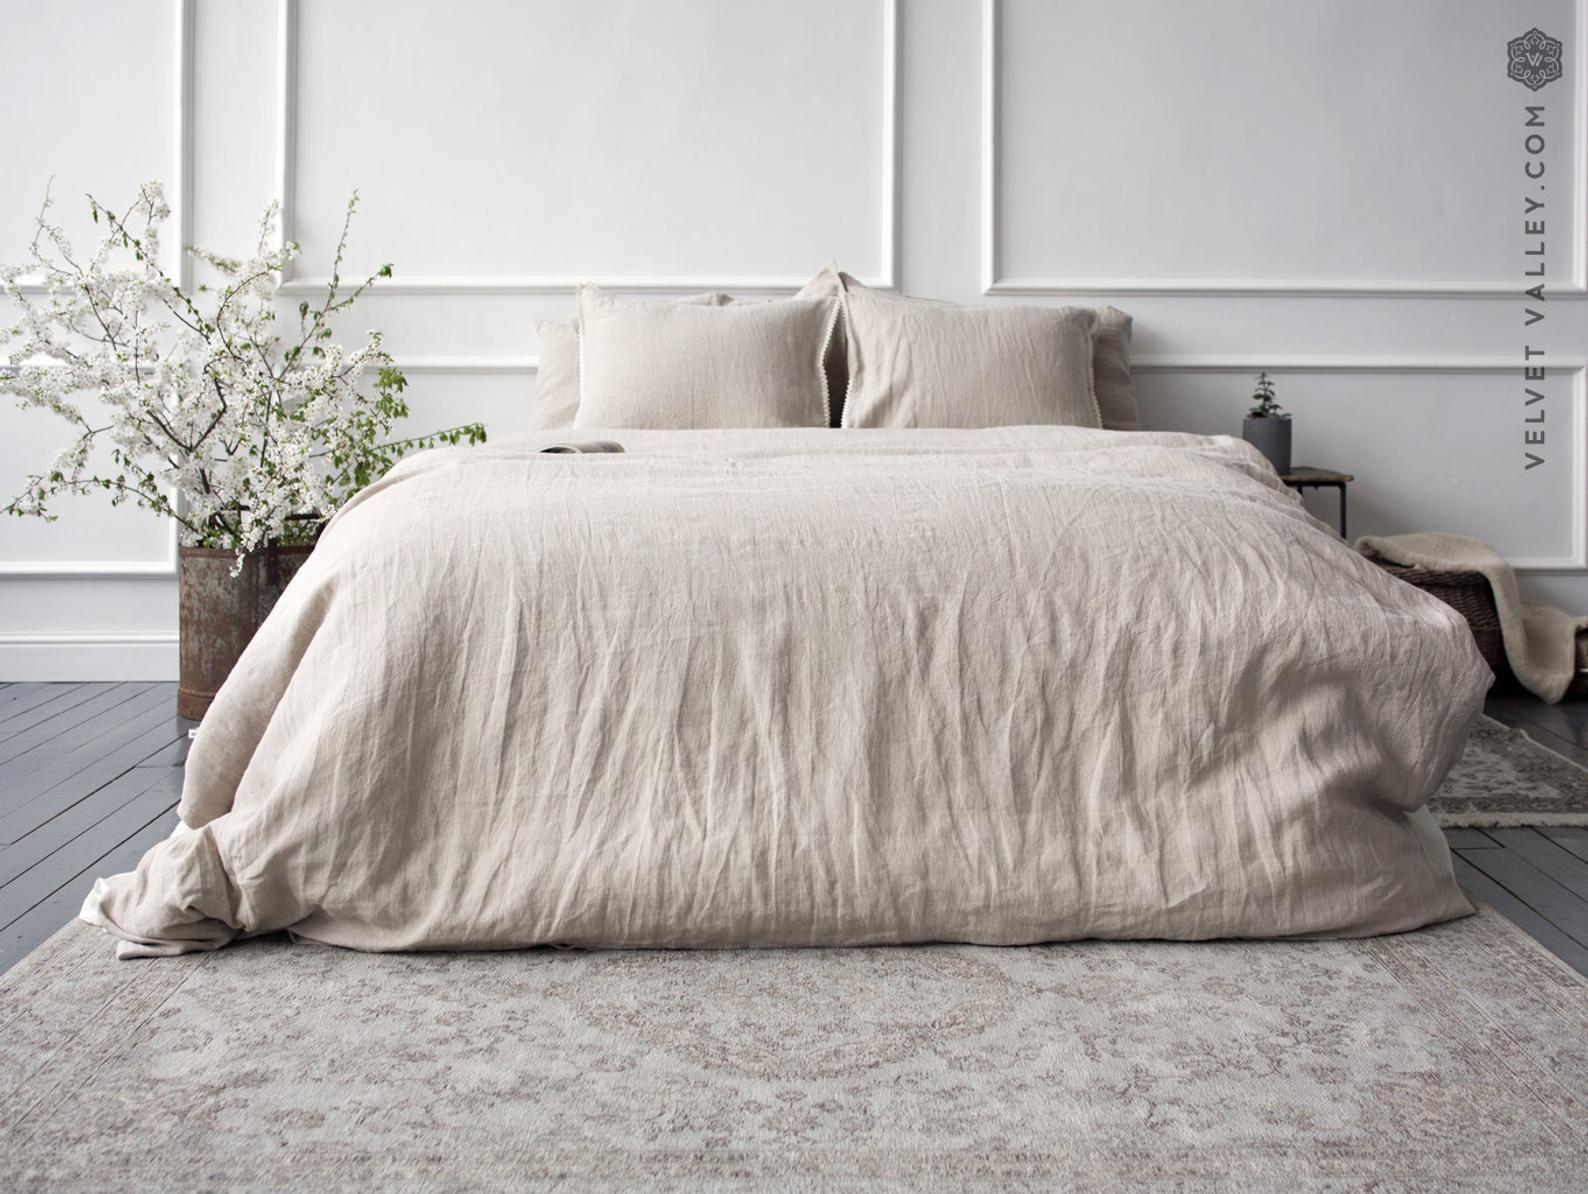 Natural Linen Comforter Cover Softened Unbleached Linen Doona Cover Full Double Queen King Size Duvet Softened Linen Duvet Cover Comforter Cover Linen Duvet Bed Linen Sets